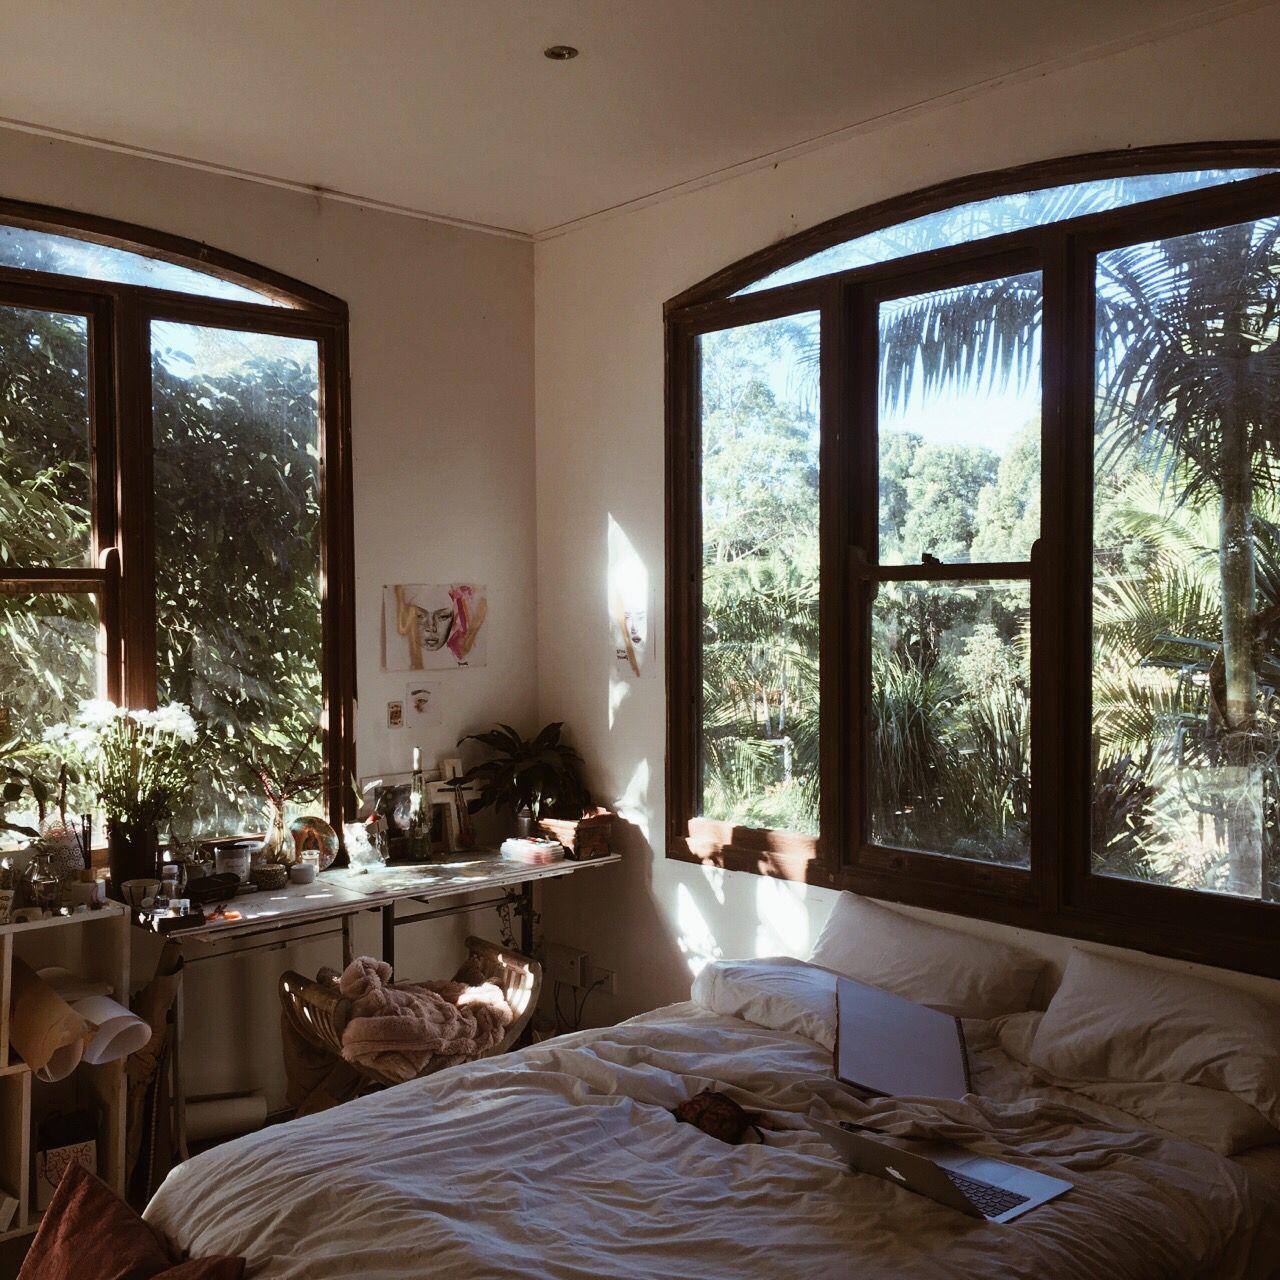 Pinterst Home Decor: Pinterest: Nuggwifee☽ ☼☾